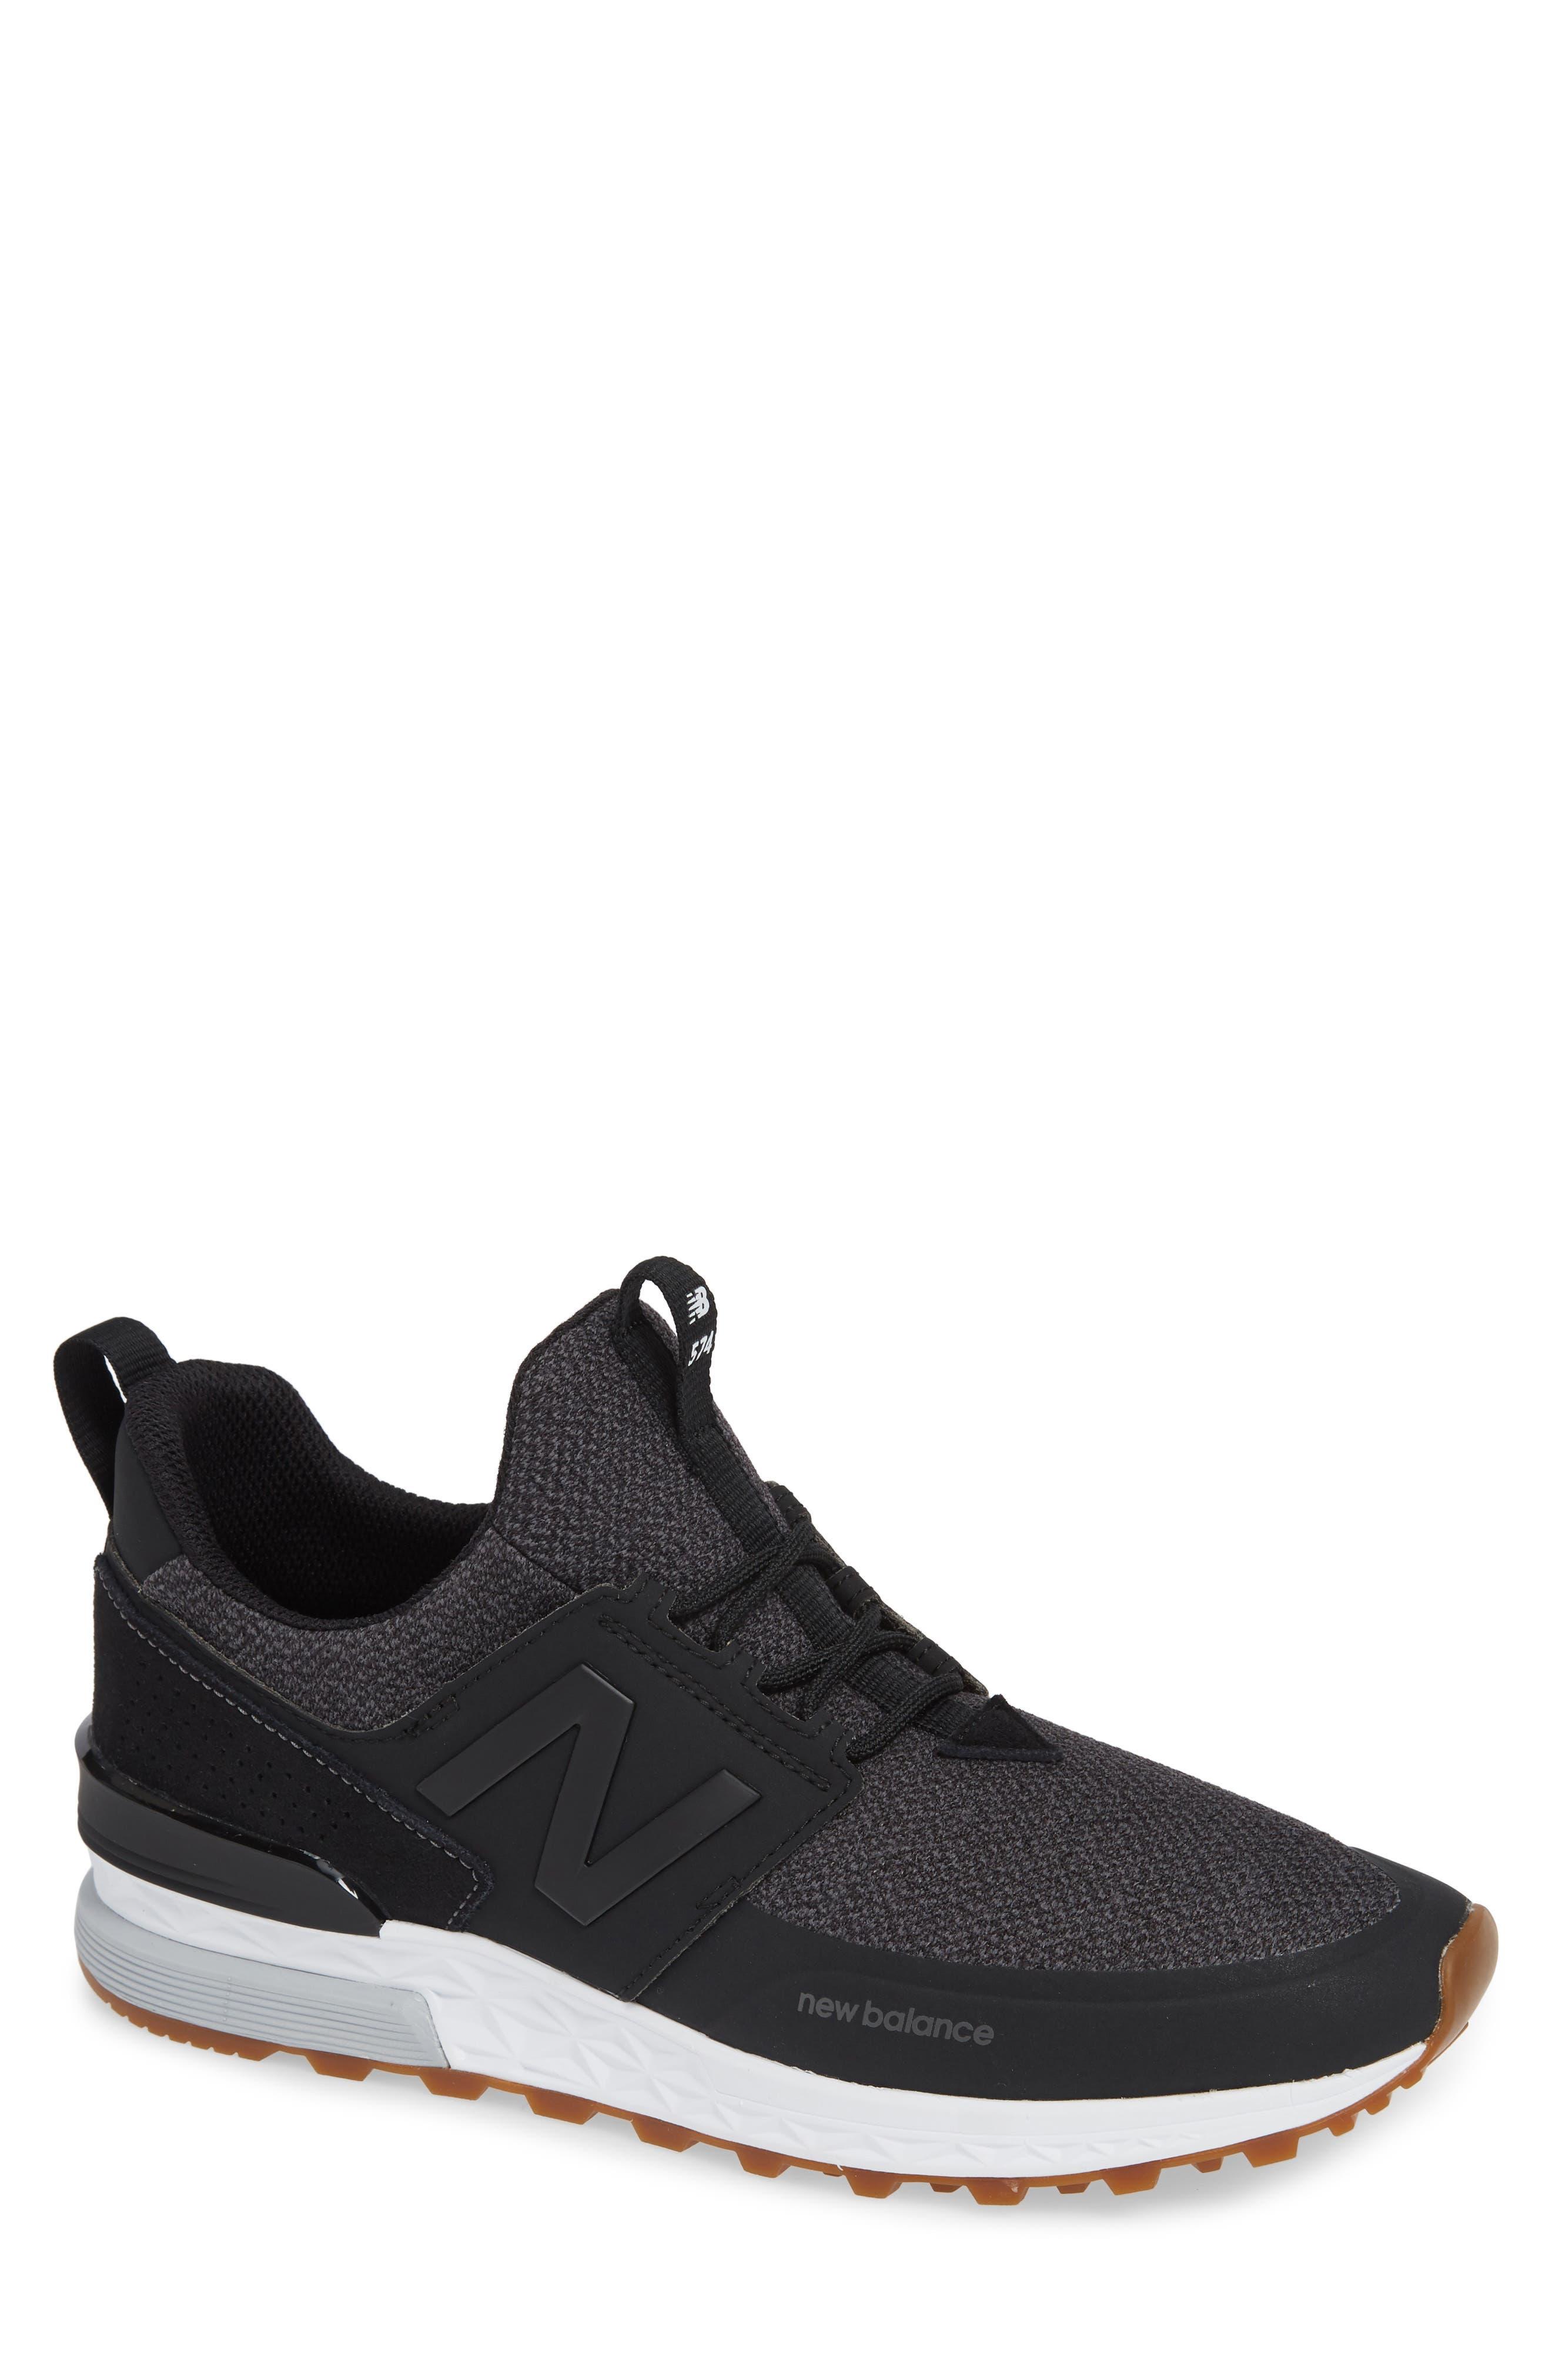 574 Sport Sneaker,                             Main thumbnail 1, color,                             BLACK SYNTHETIC/ TEXTILE